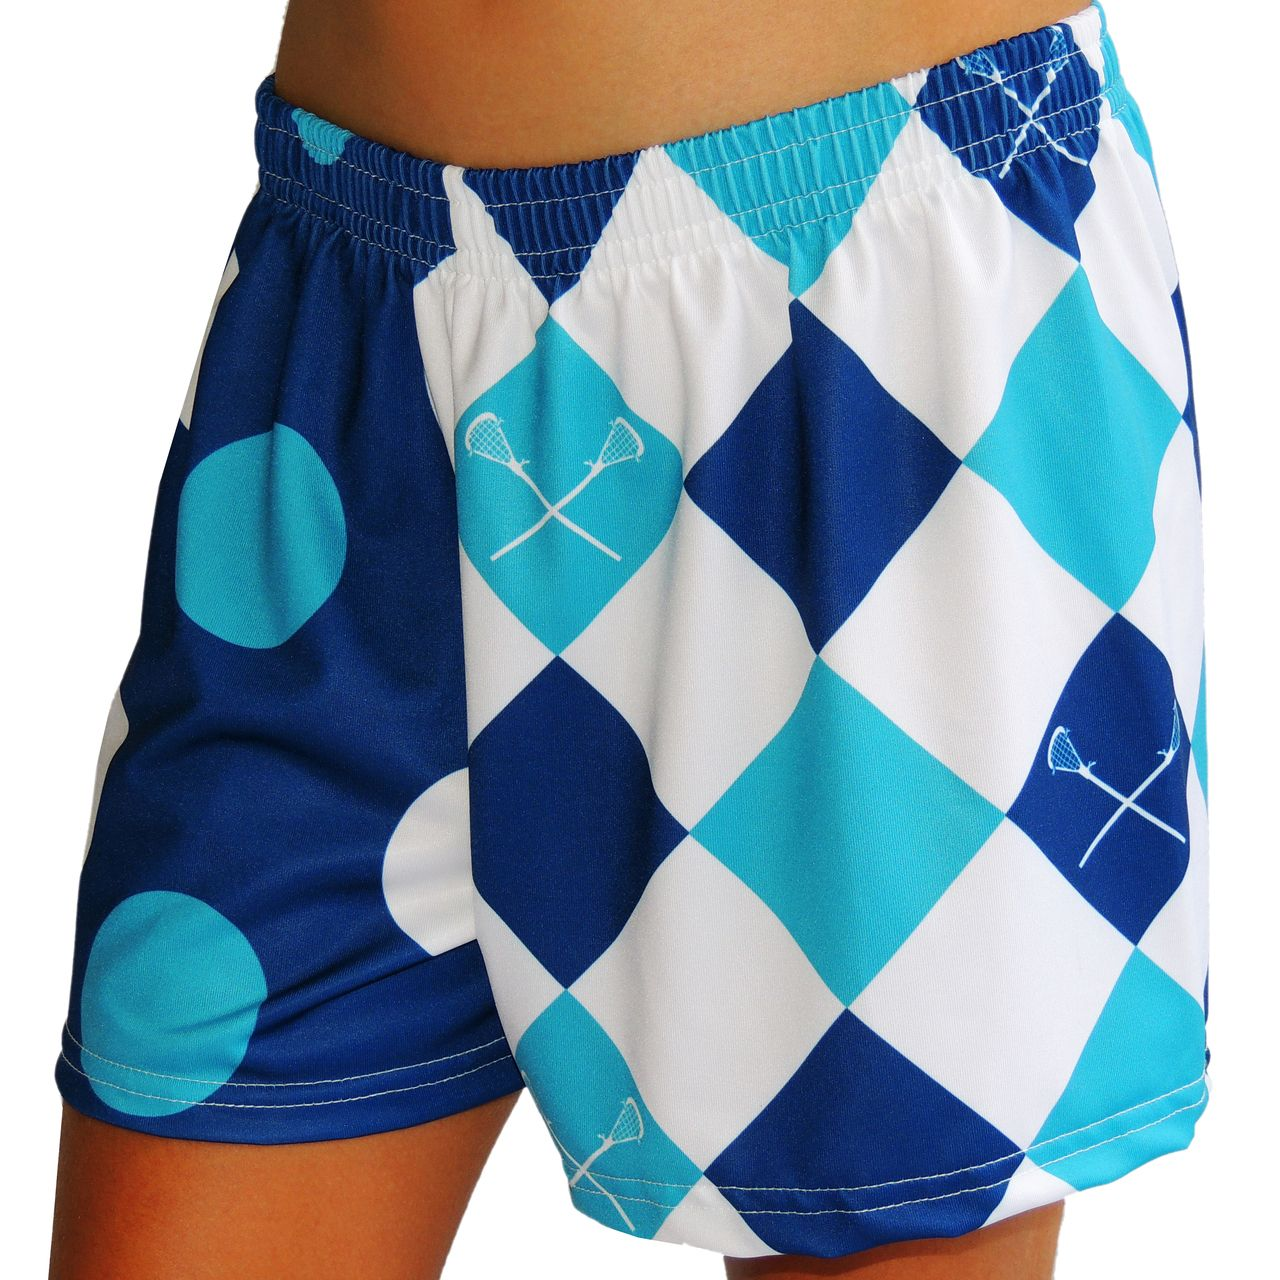 Blue Sublimated Lax Shorts Youth Teal Lacrosse Short Boys Lacrosse Shorts